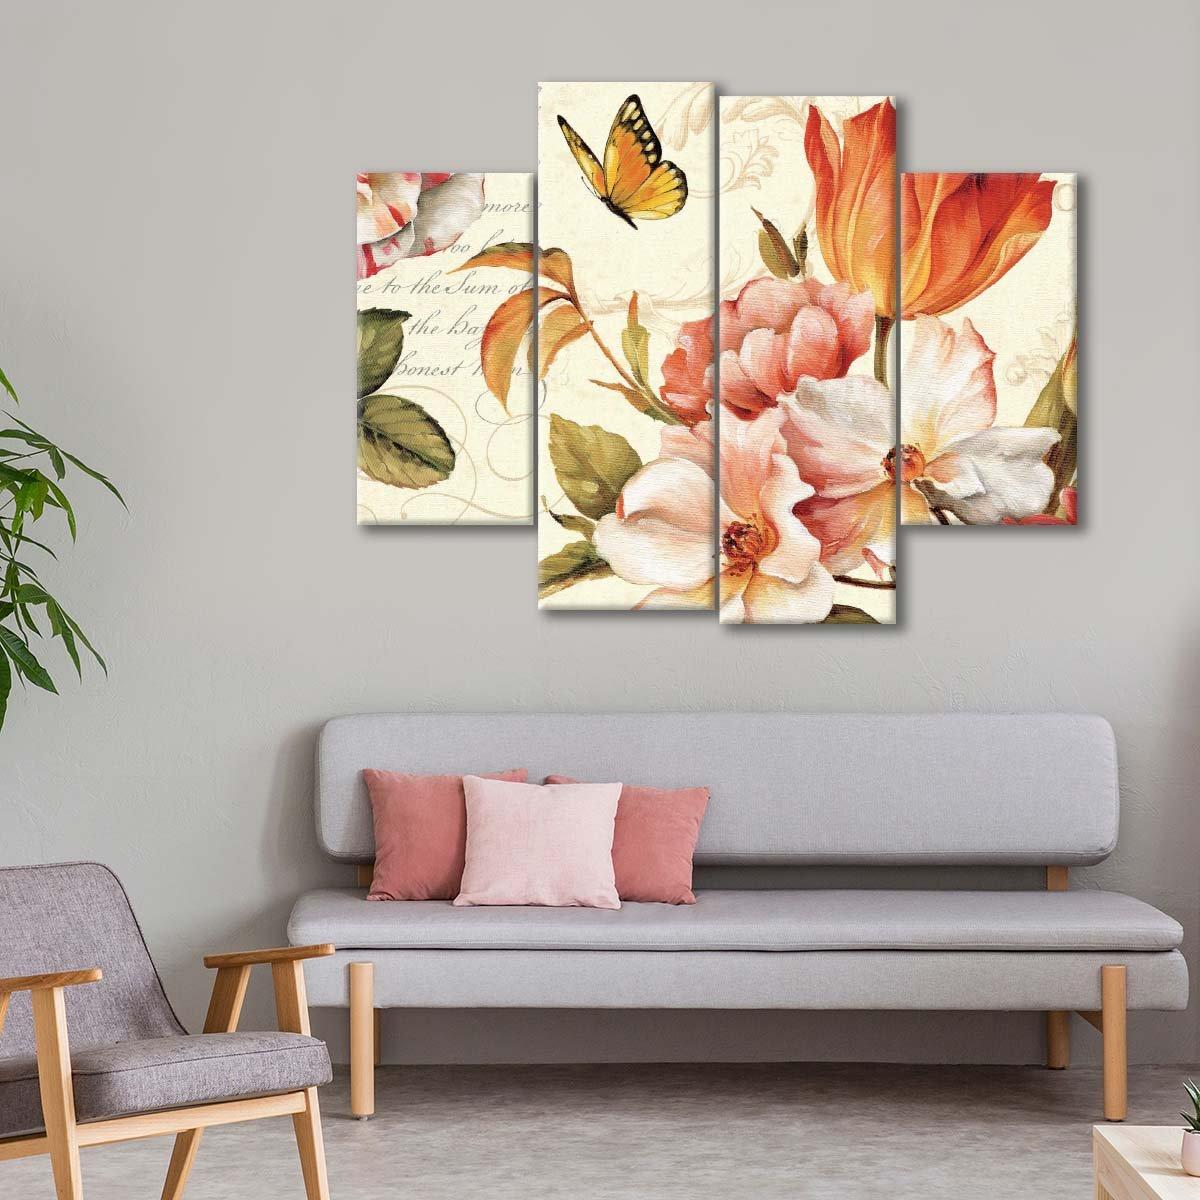 Poesie Florale III Multi Panel Canvas Wall Art